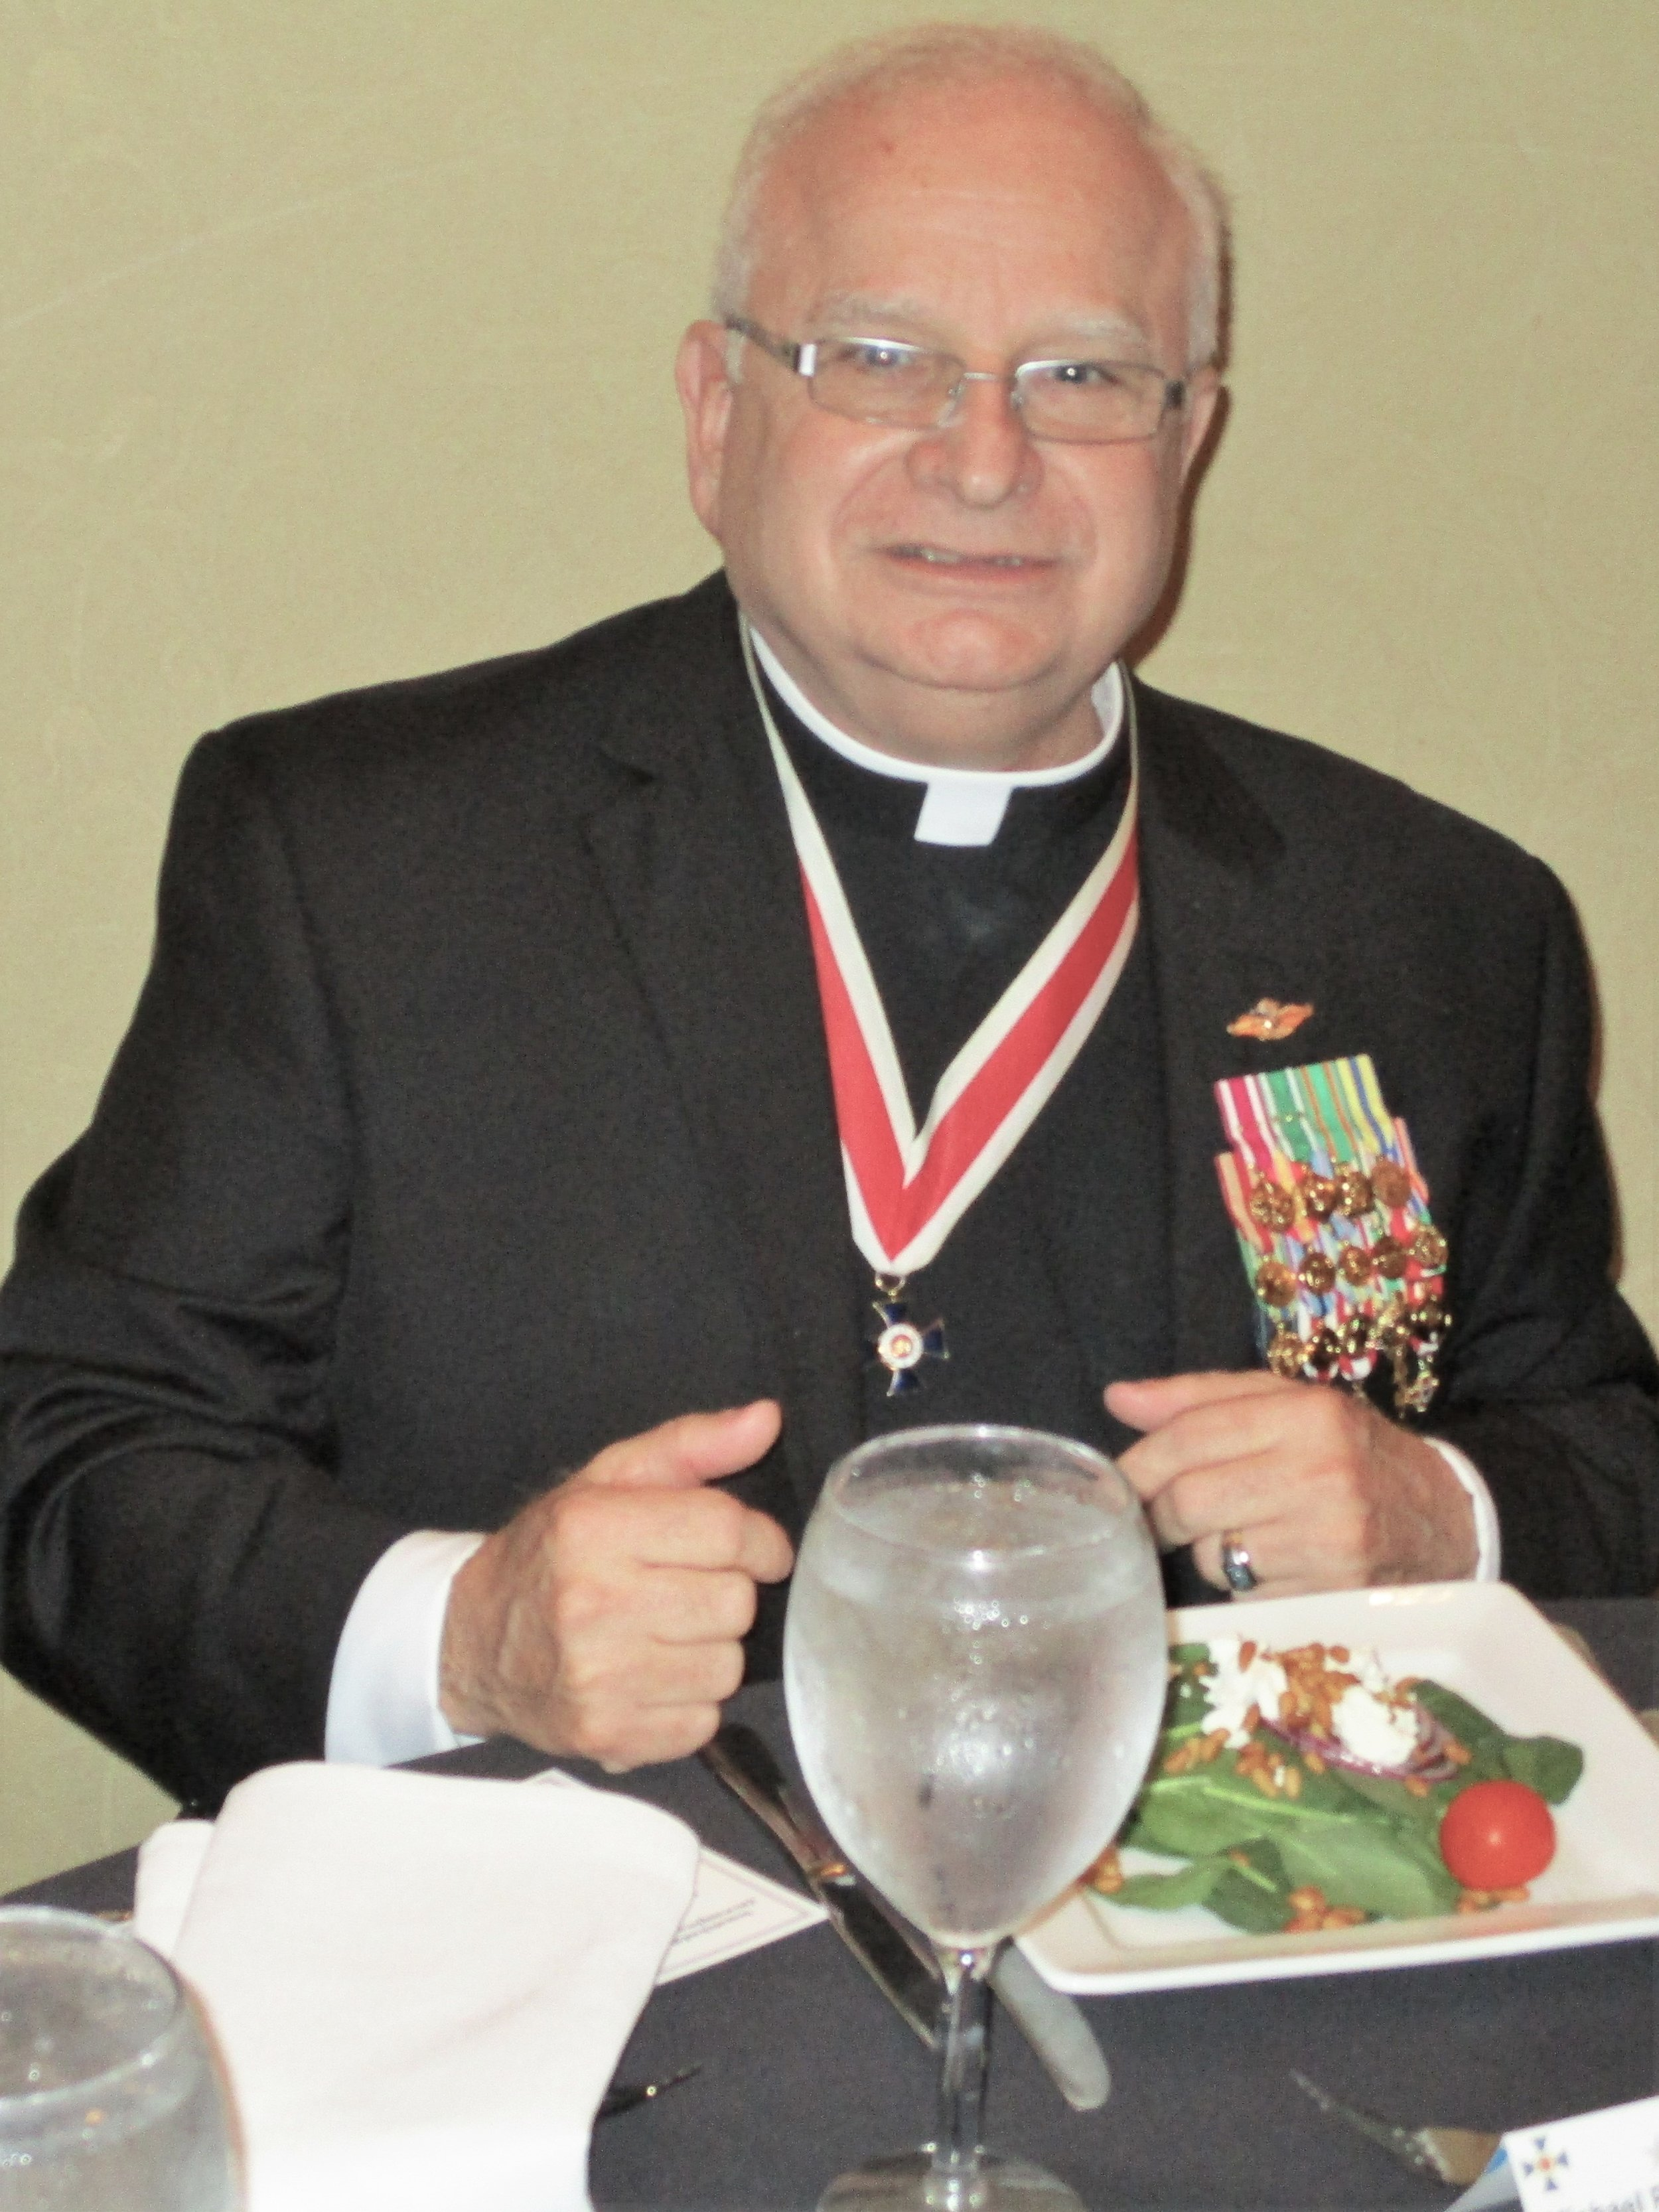 Chaplain General, CDR Michael Zuffoletto